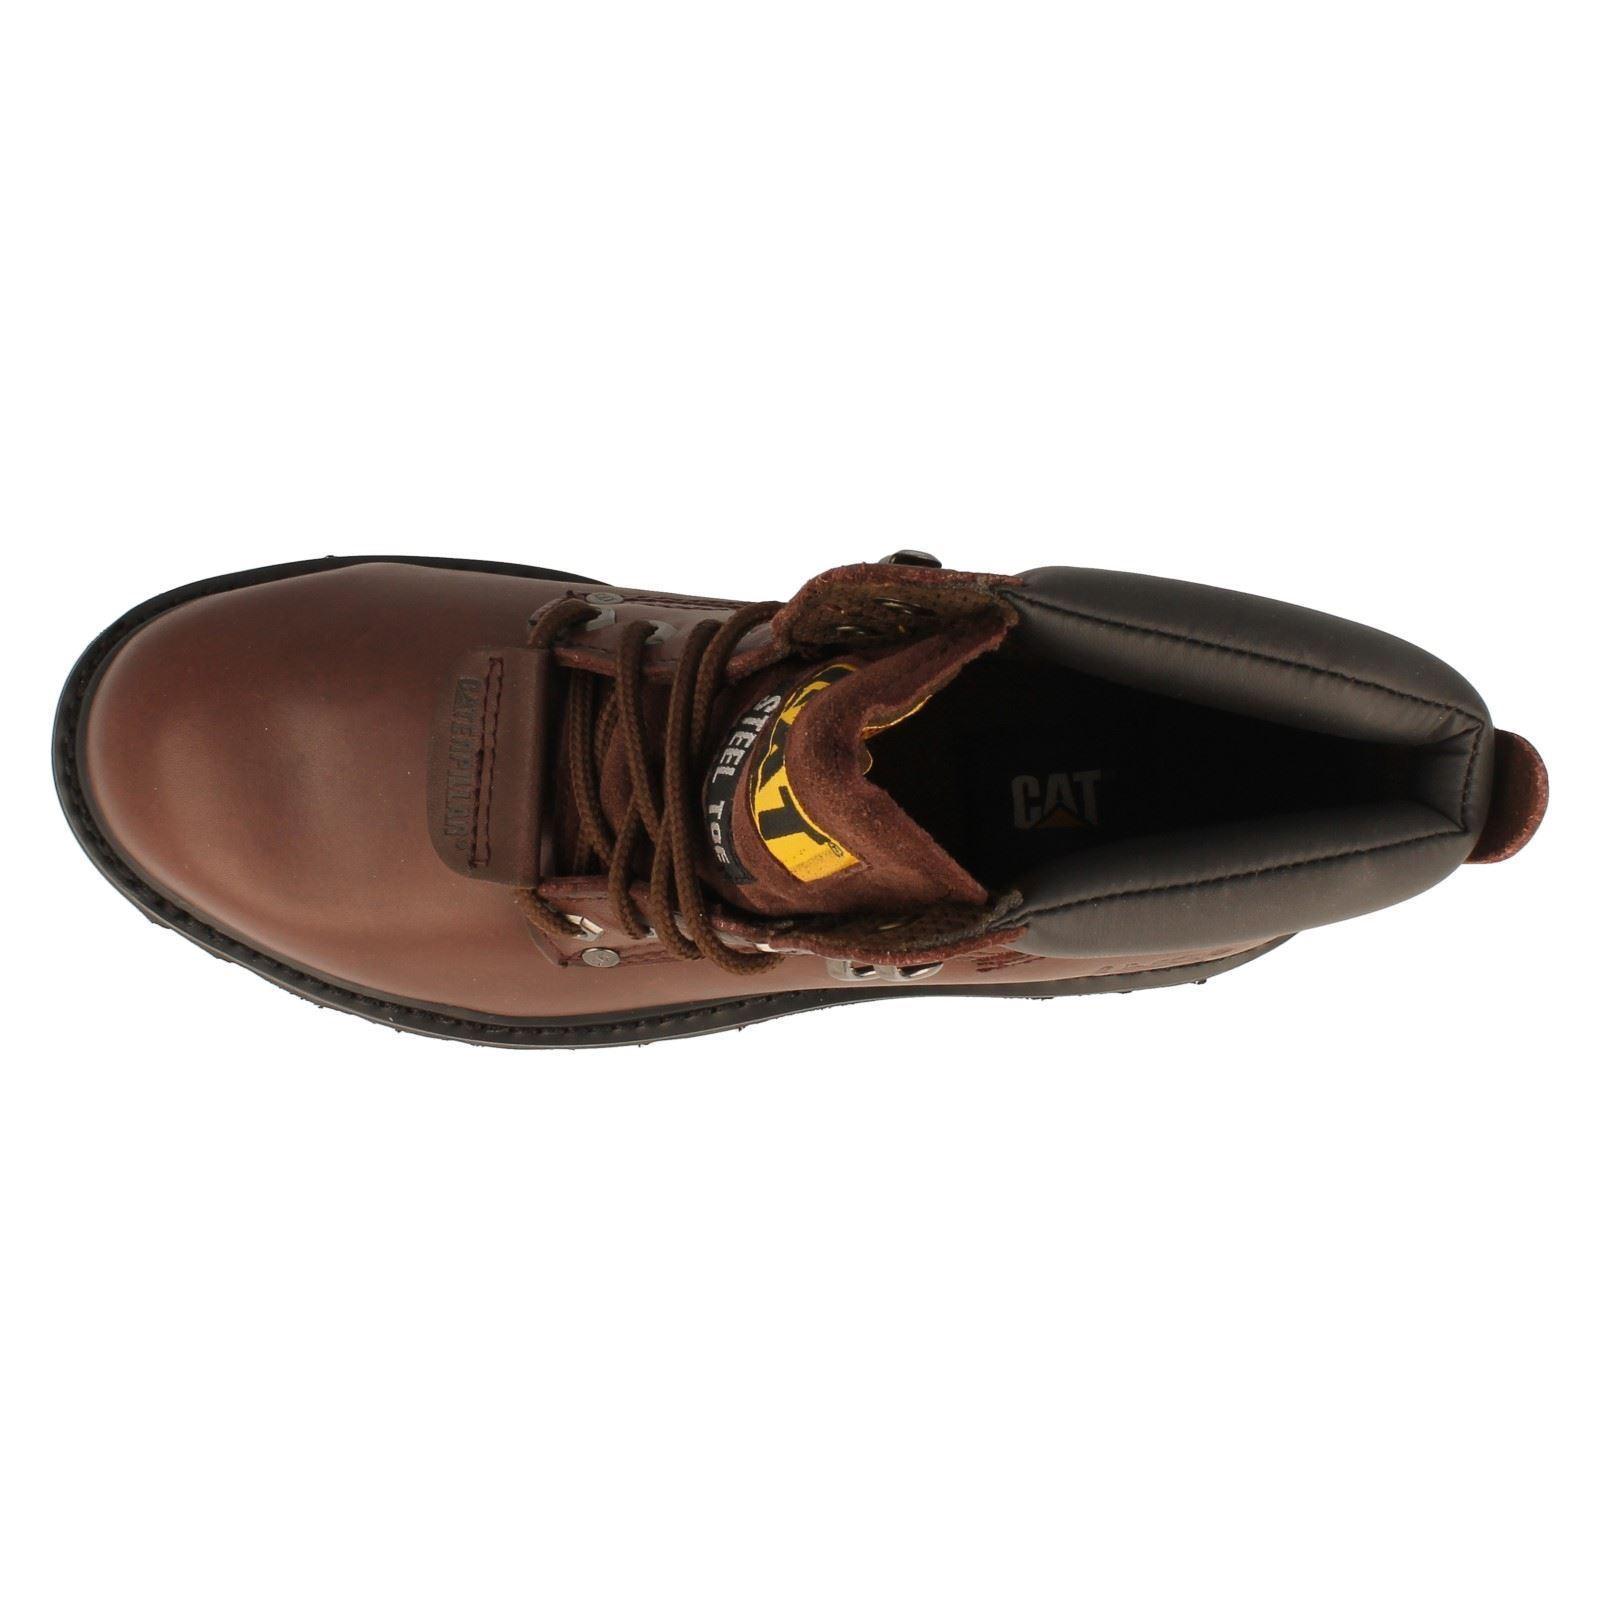 Mens Caterpillar Steel Toe Safety Work Boots Label - Sheffield